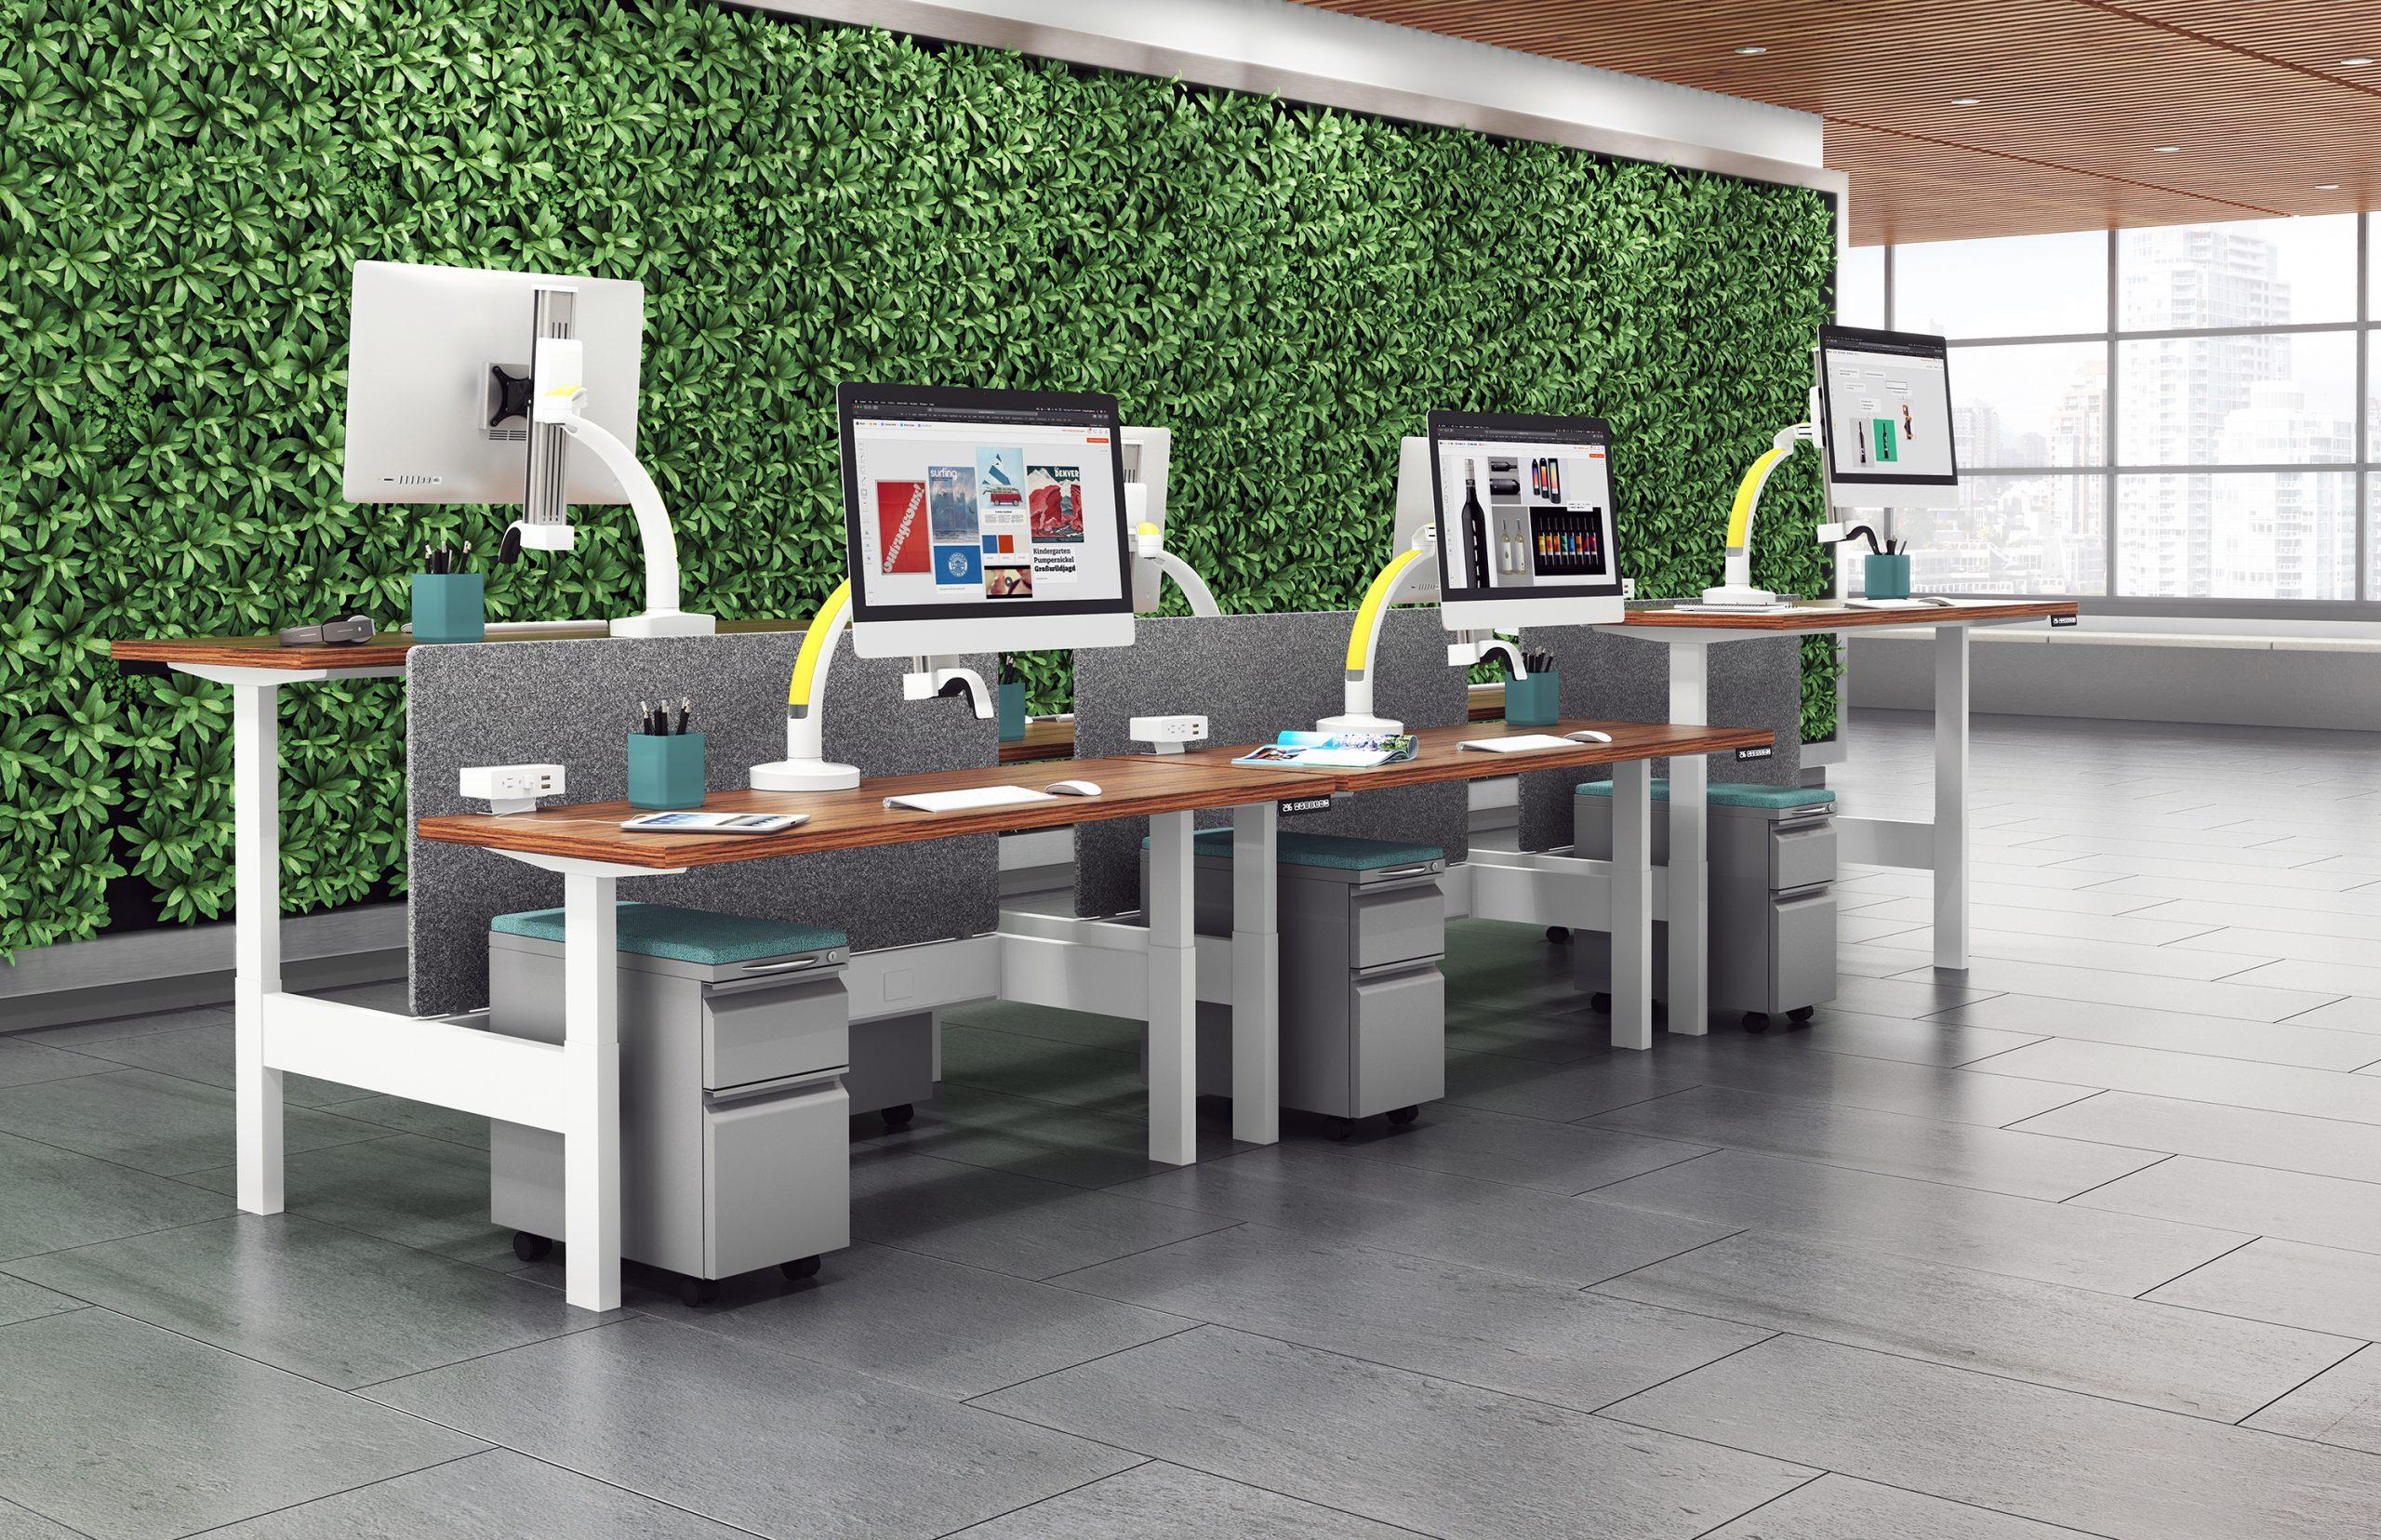 "Ella lifestyle HAT benching 6 pack biophilic wall scaled <ul> <li>Screen size up to: 43""</li> <li>Available in Flat White, Silver, Vista Black</li> <li>Height adjustment: 11.5"" | Extension range 24.4""</li> <li>Pivot: Landscape / Portrait</li> <li>Rotation: 180° at base, 360° at upper joints</li> <li>Mount Configurations: Desk Edge and Grommet</li> <li>Vesa Compatibility: 75 & 100mm, adapter included</li> <li>Warranty 10 Years</li> </ul>"